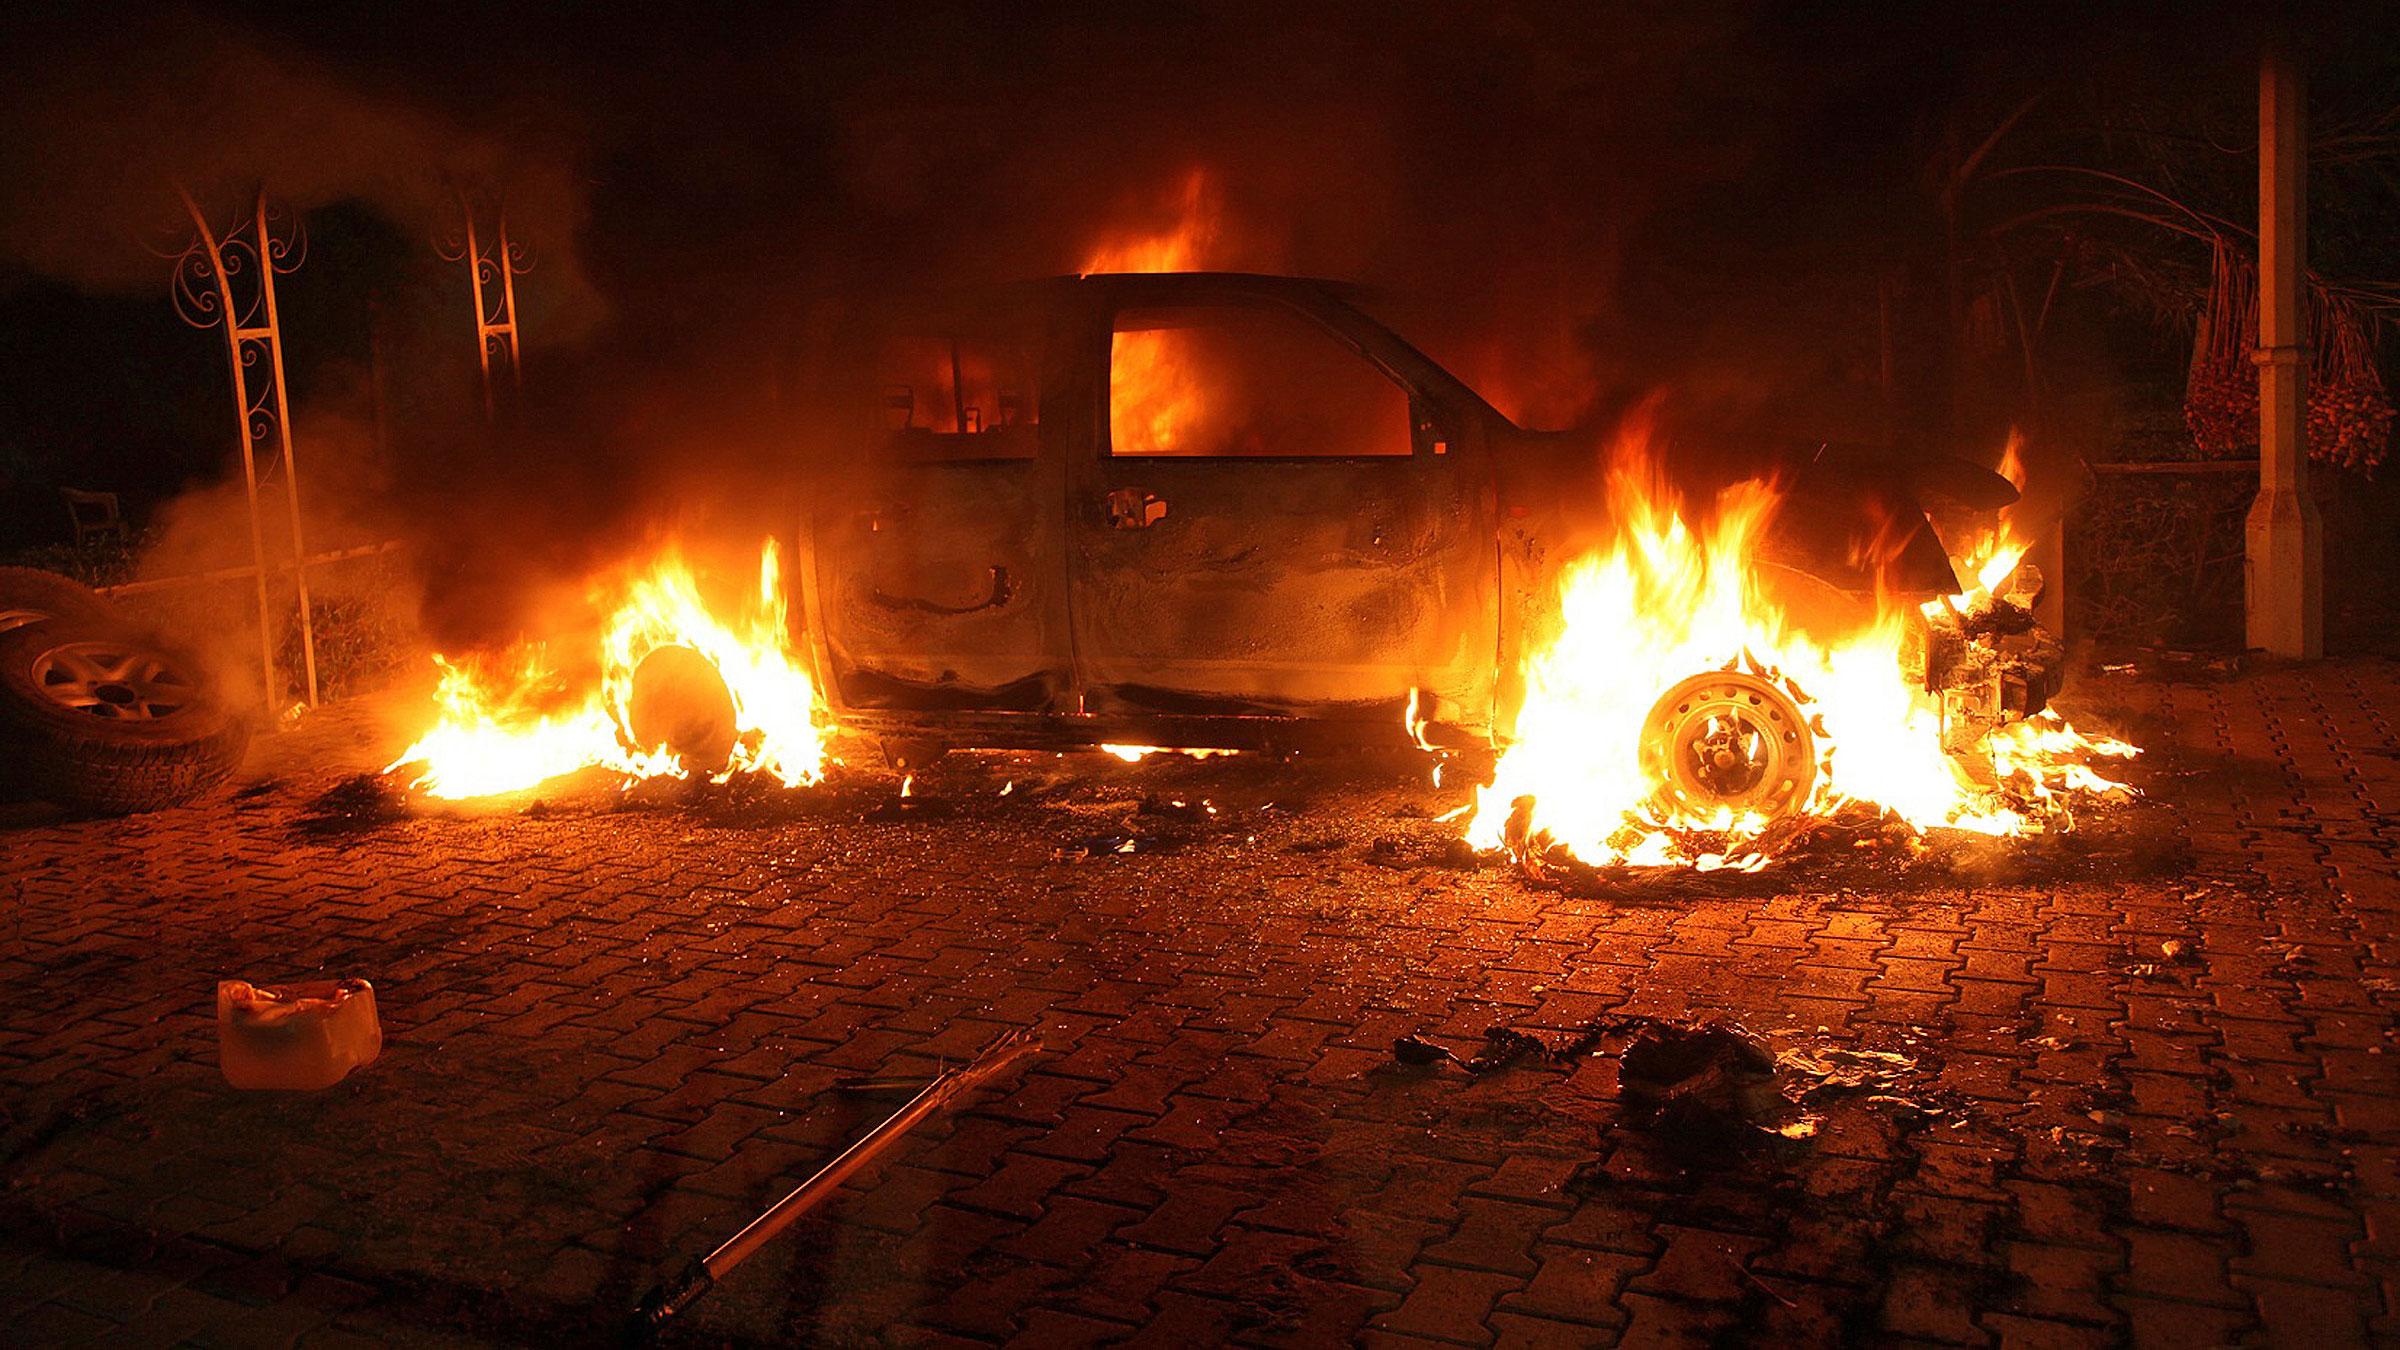 Mustafa Al-Imam Sentenced to More than 19 Years in Prison for September 2012 Terrorist Attack in Benghazi, Libya…